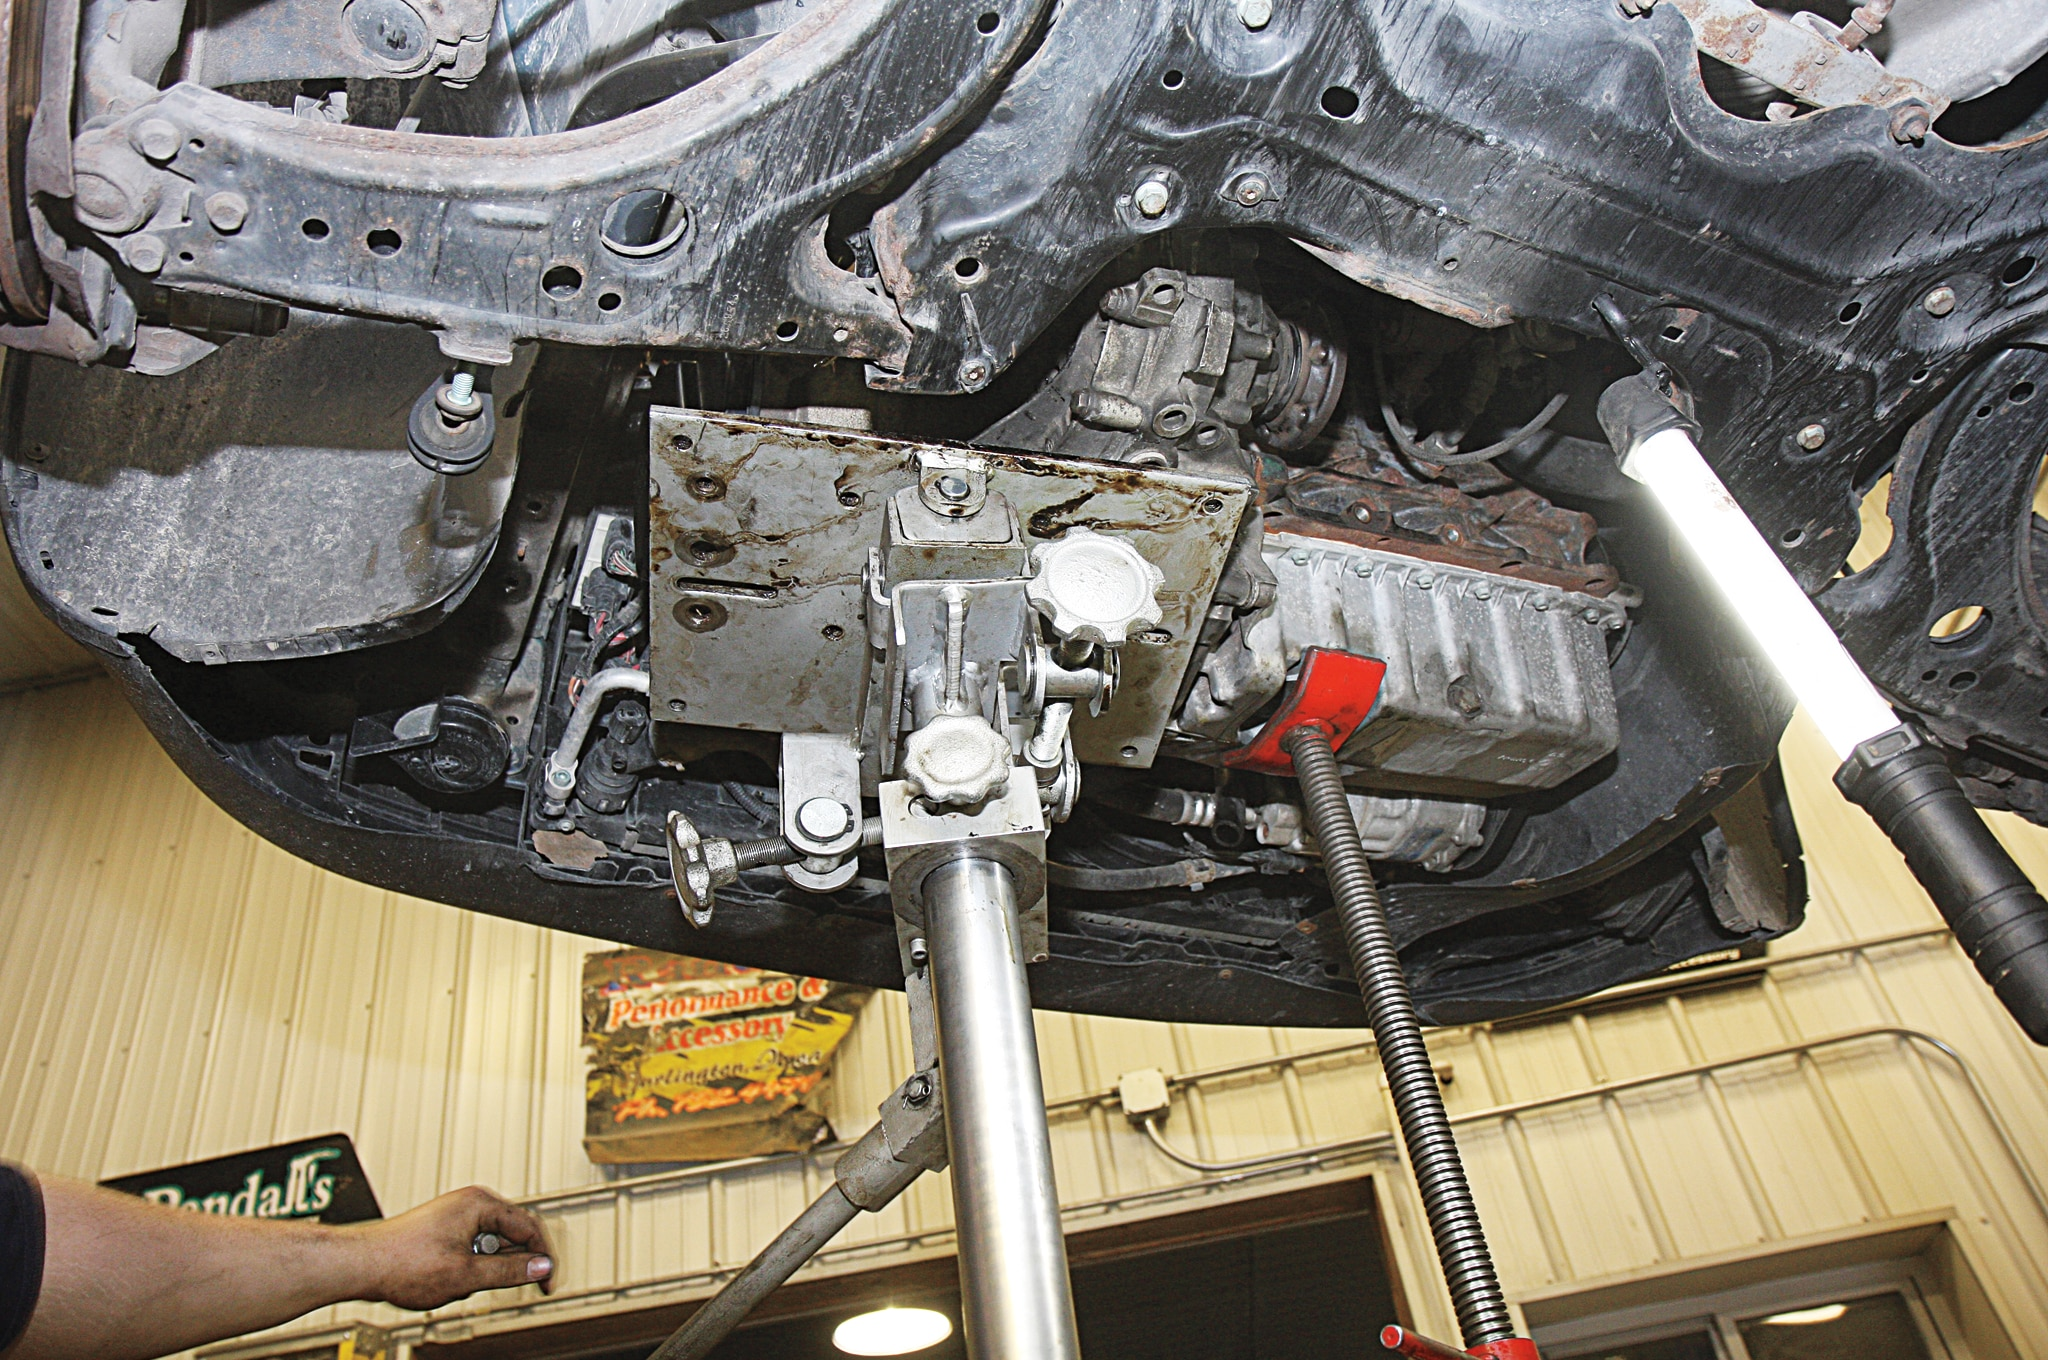 medium resolution of 2002 volkswagen jetta tdi 5 speed transmission view photo gallery 13 photos